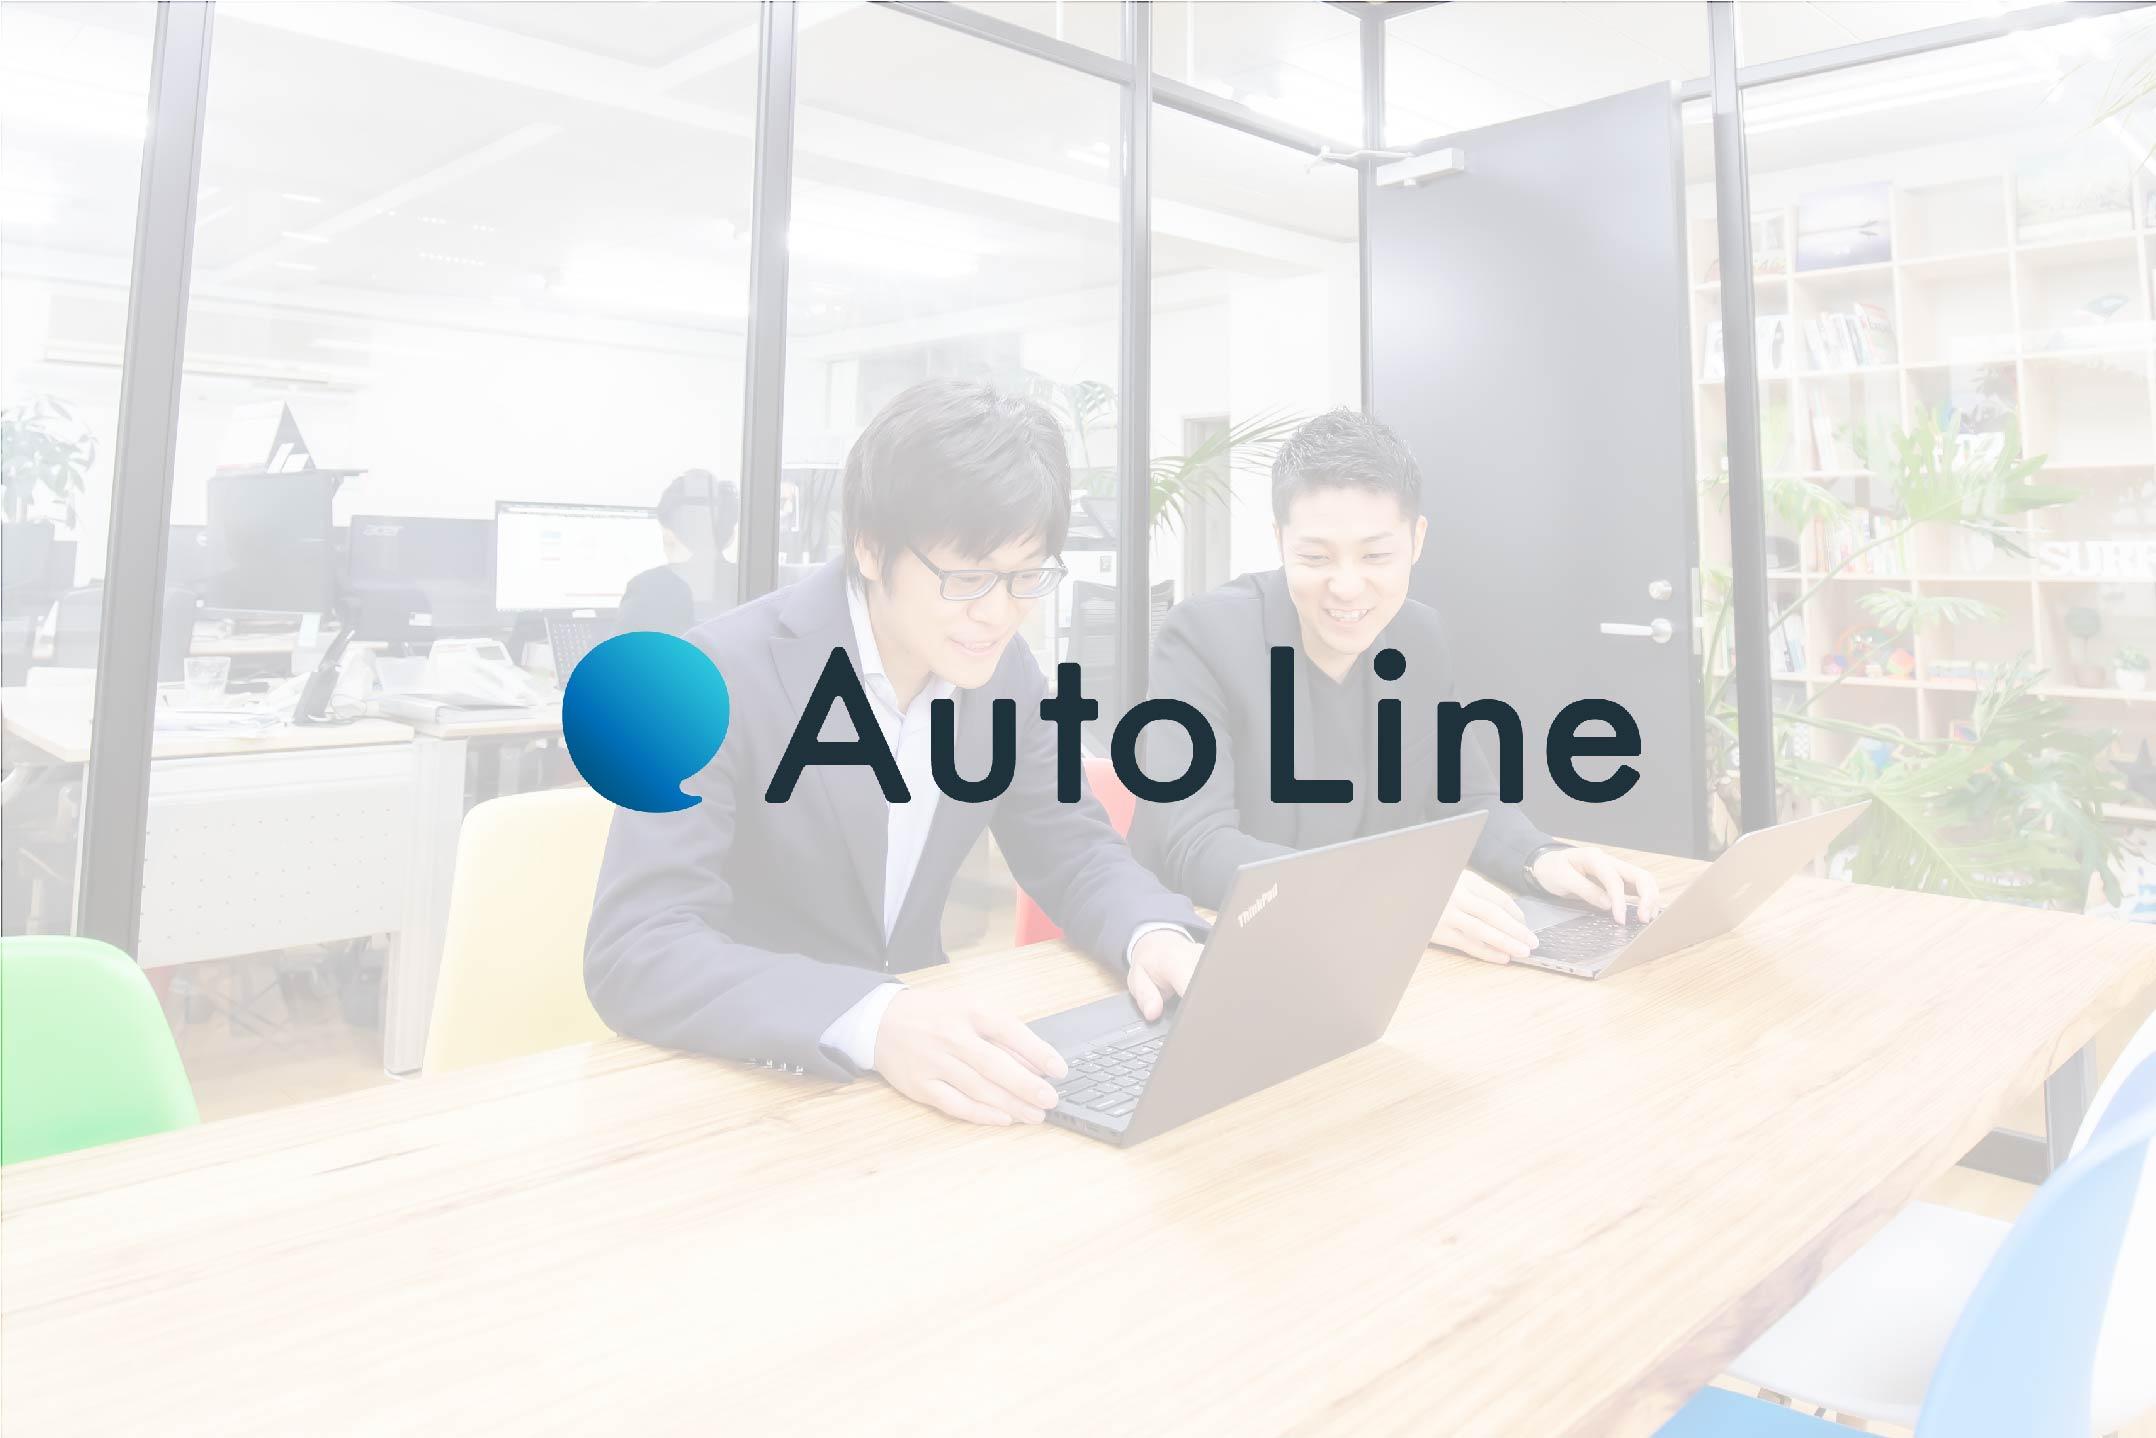 SaaSセールス兼ディレクター(AutoLine事業or新規事業)